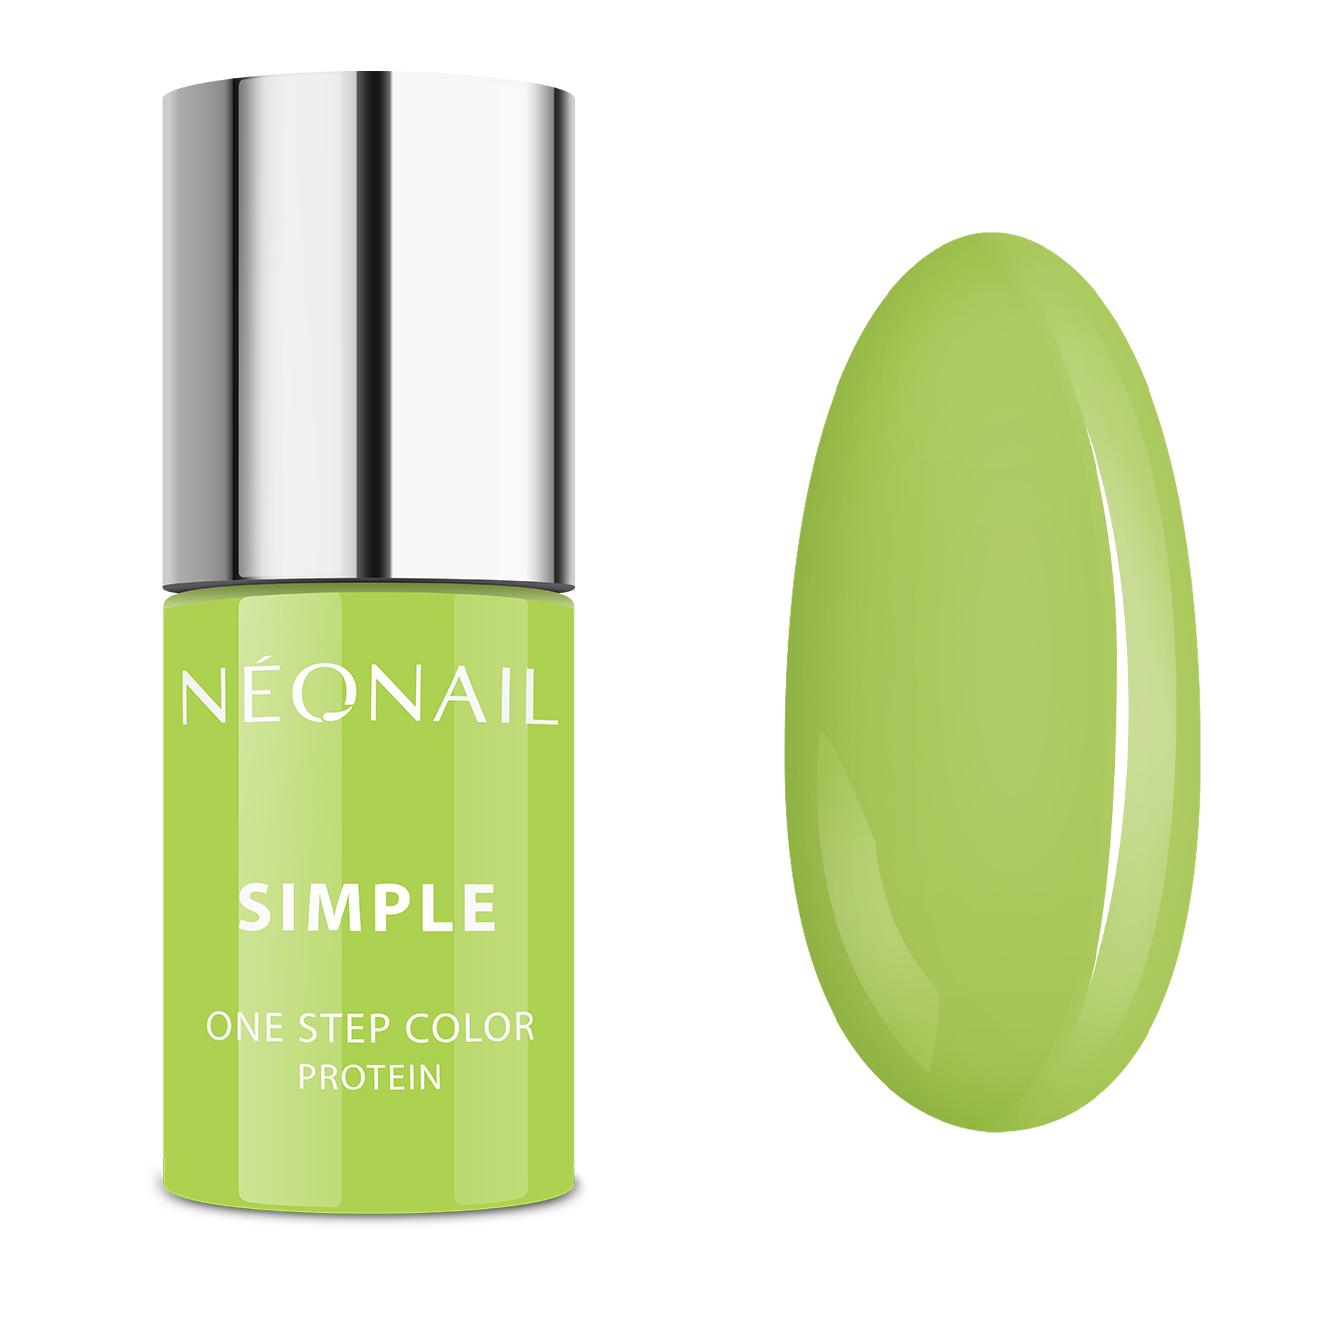 NeoNail 3w1 SMILEY